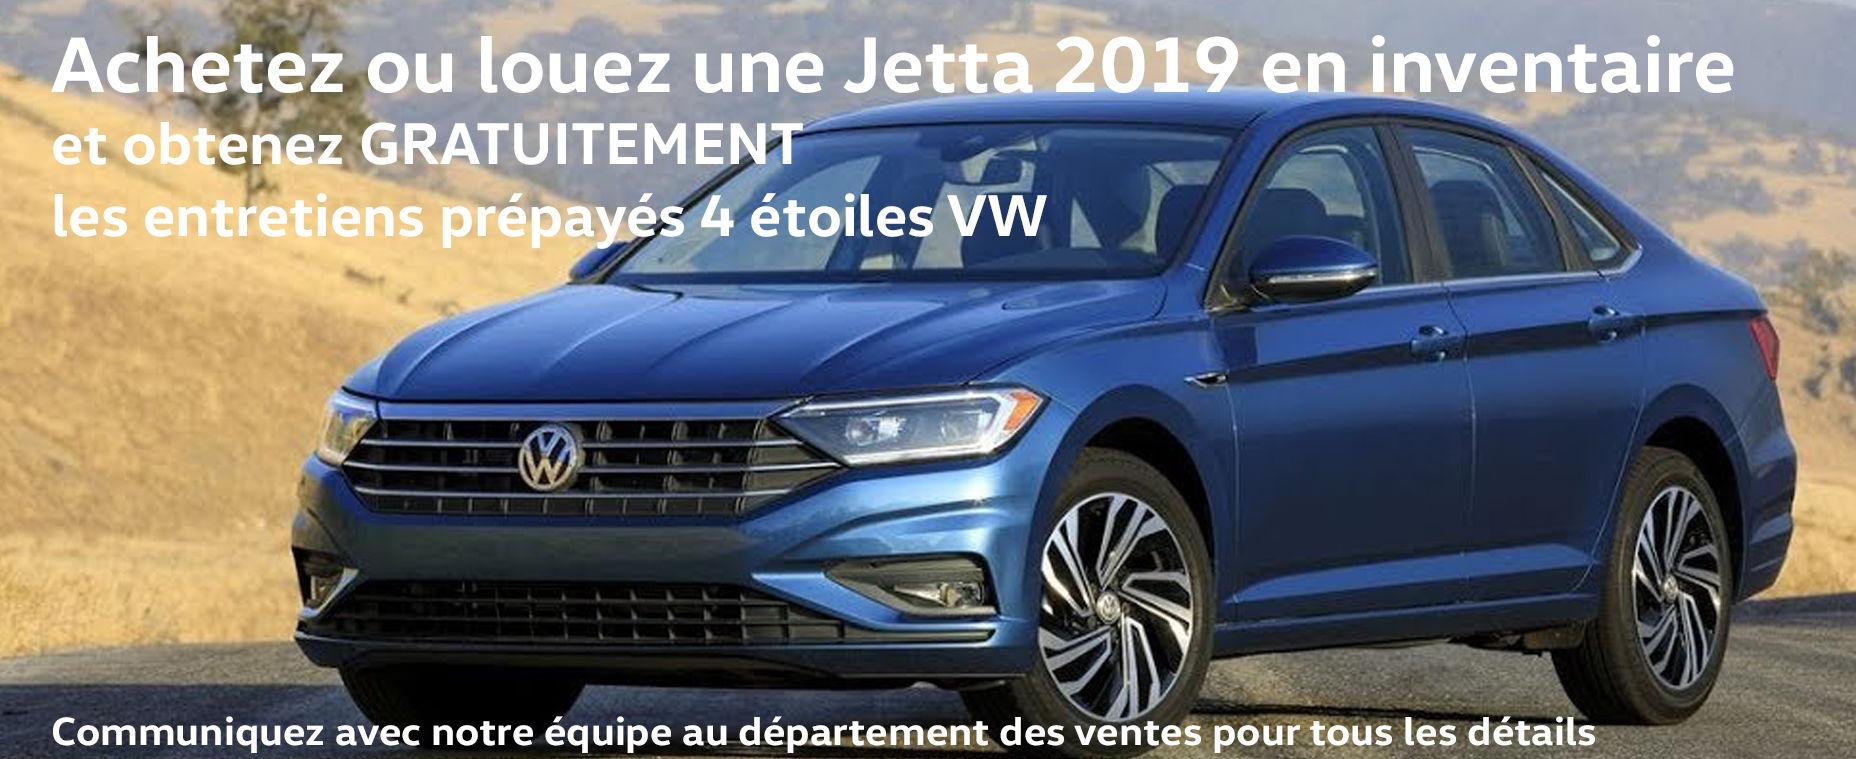 Promotion août 2019